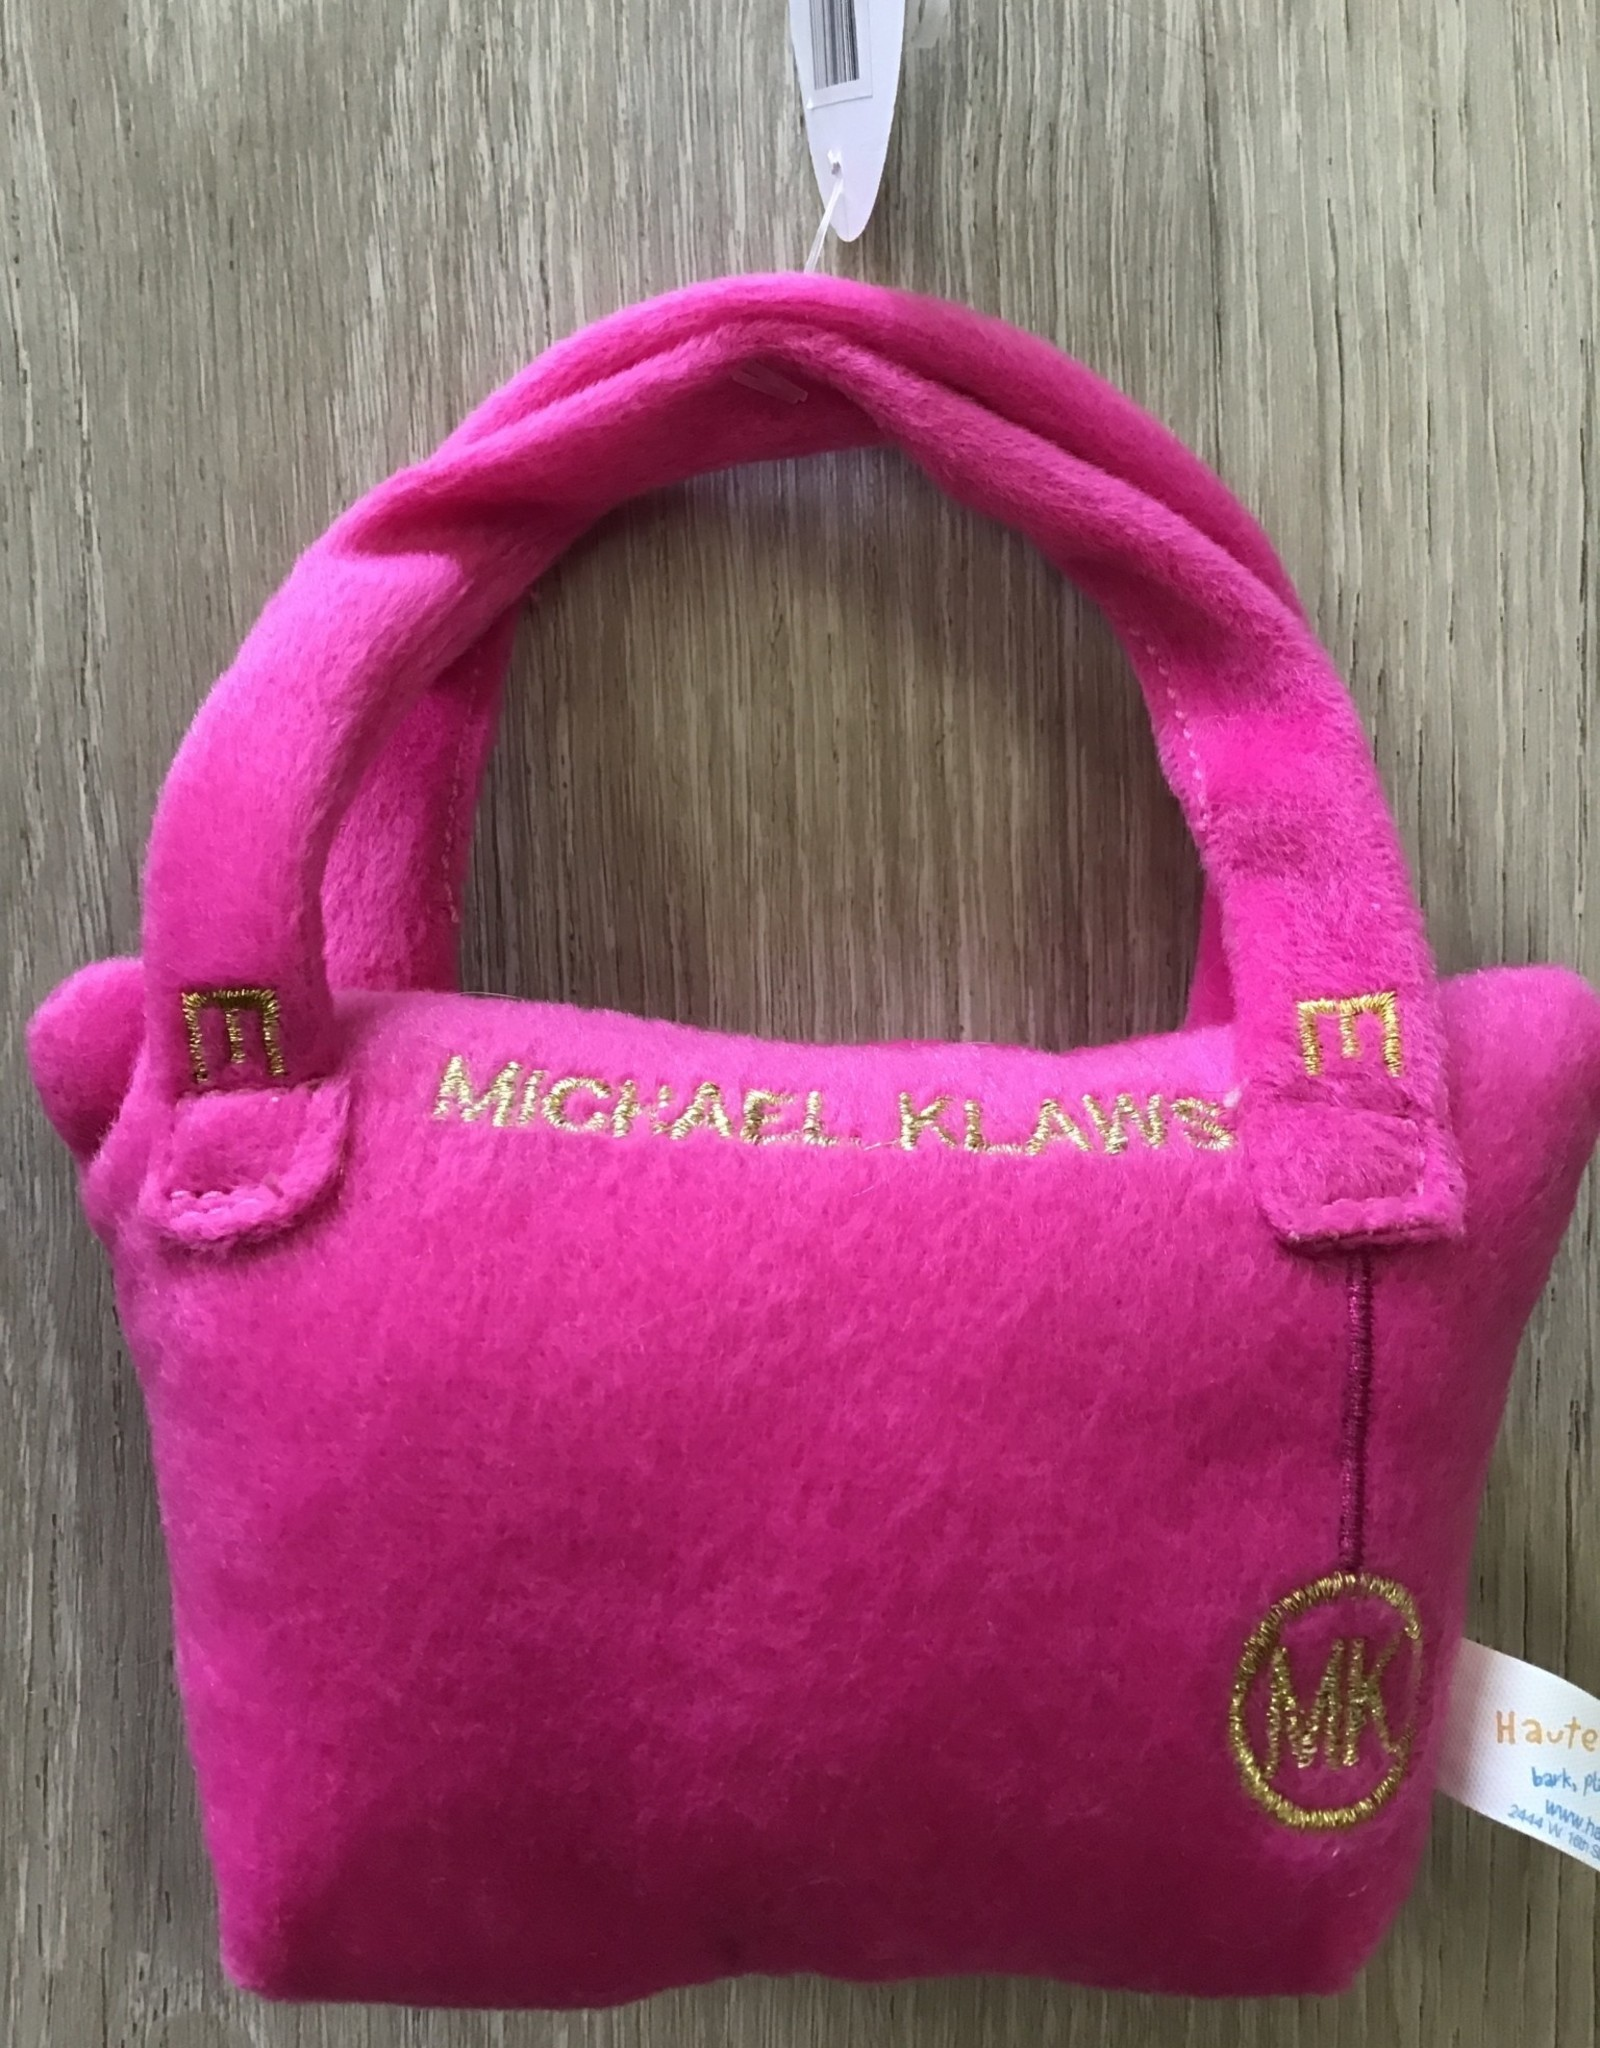 Haute Diggity Dog Haute Diggity Dog Toys - michael klaws handbag